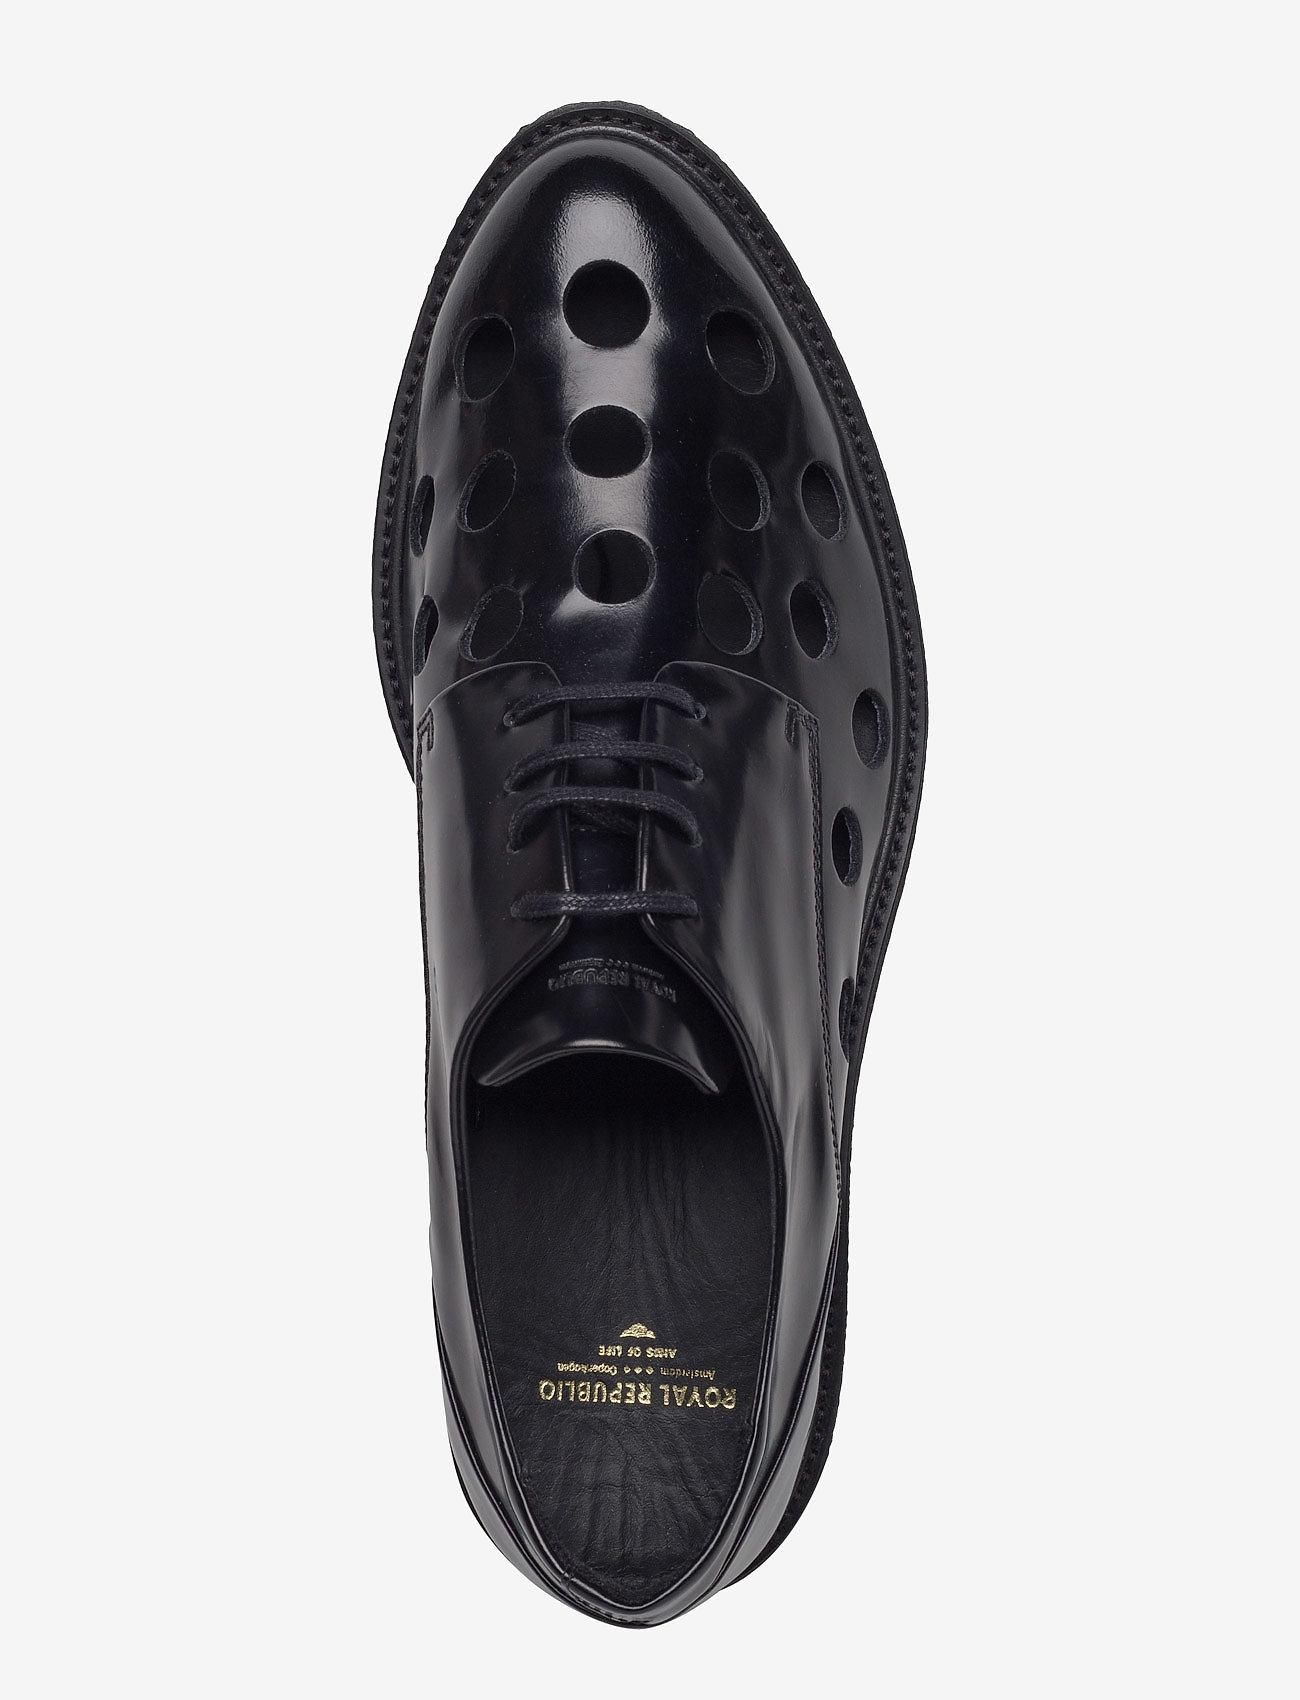 Border Creep Punched Shoe (Black) - Royal RepubliQ